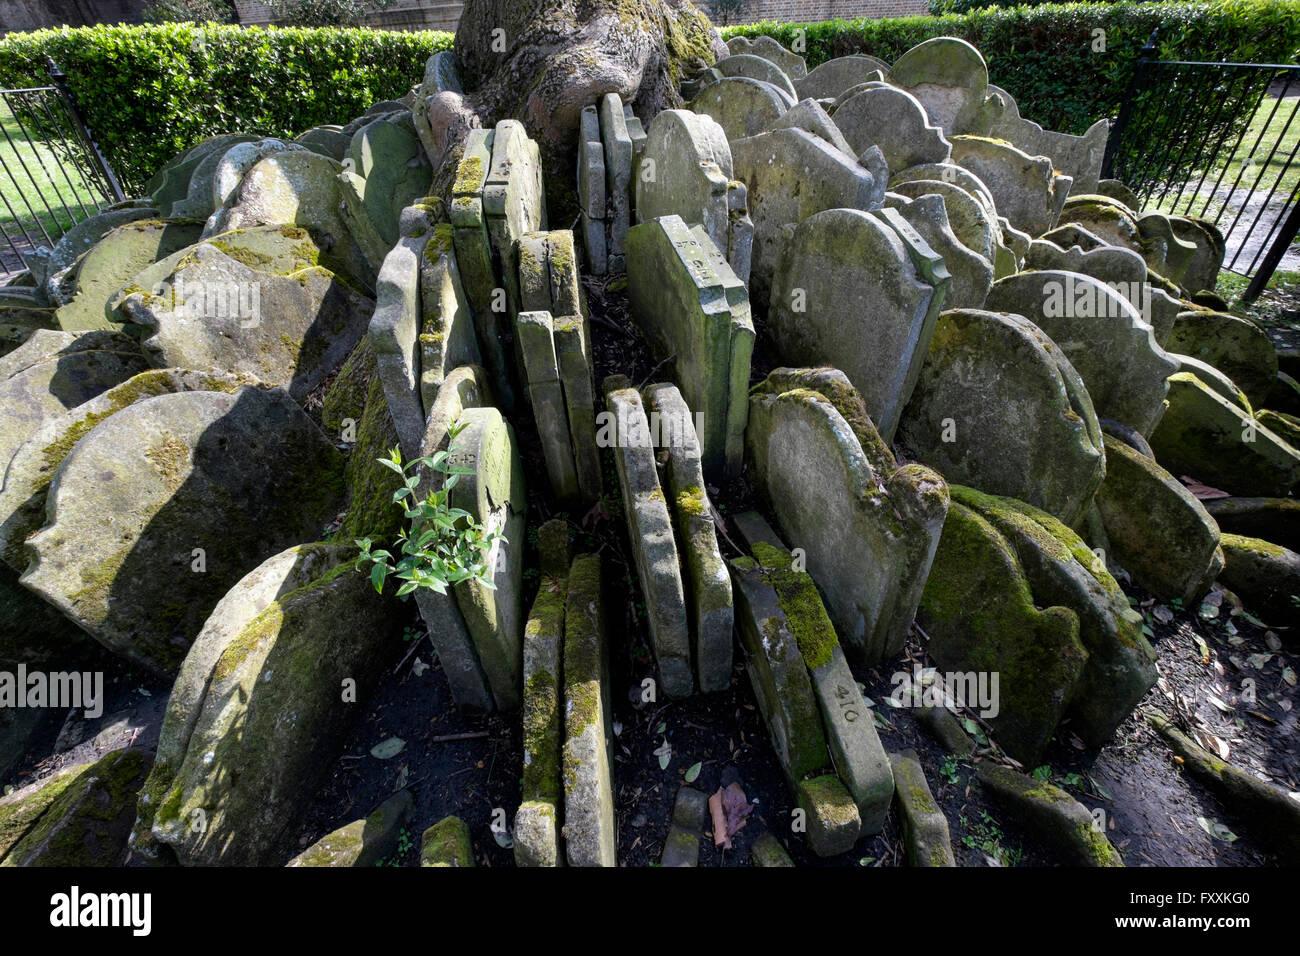 Moss-clad tombstones encircle the Hardy tree, St Pancras Old Church churchyard, London England UK - Stock Image